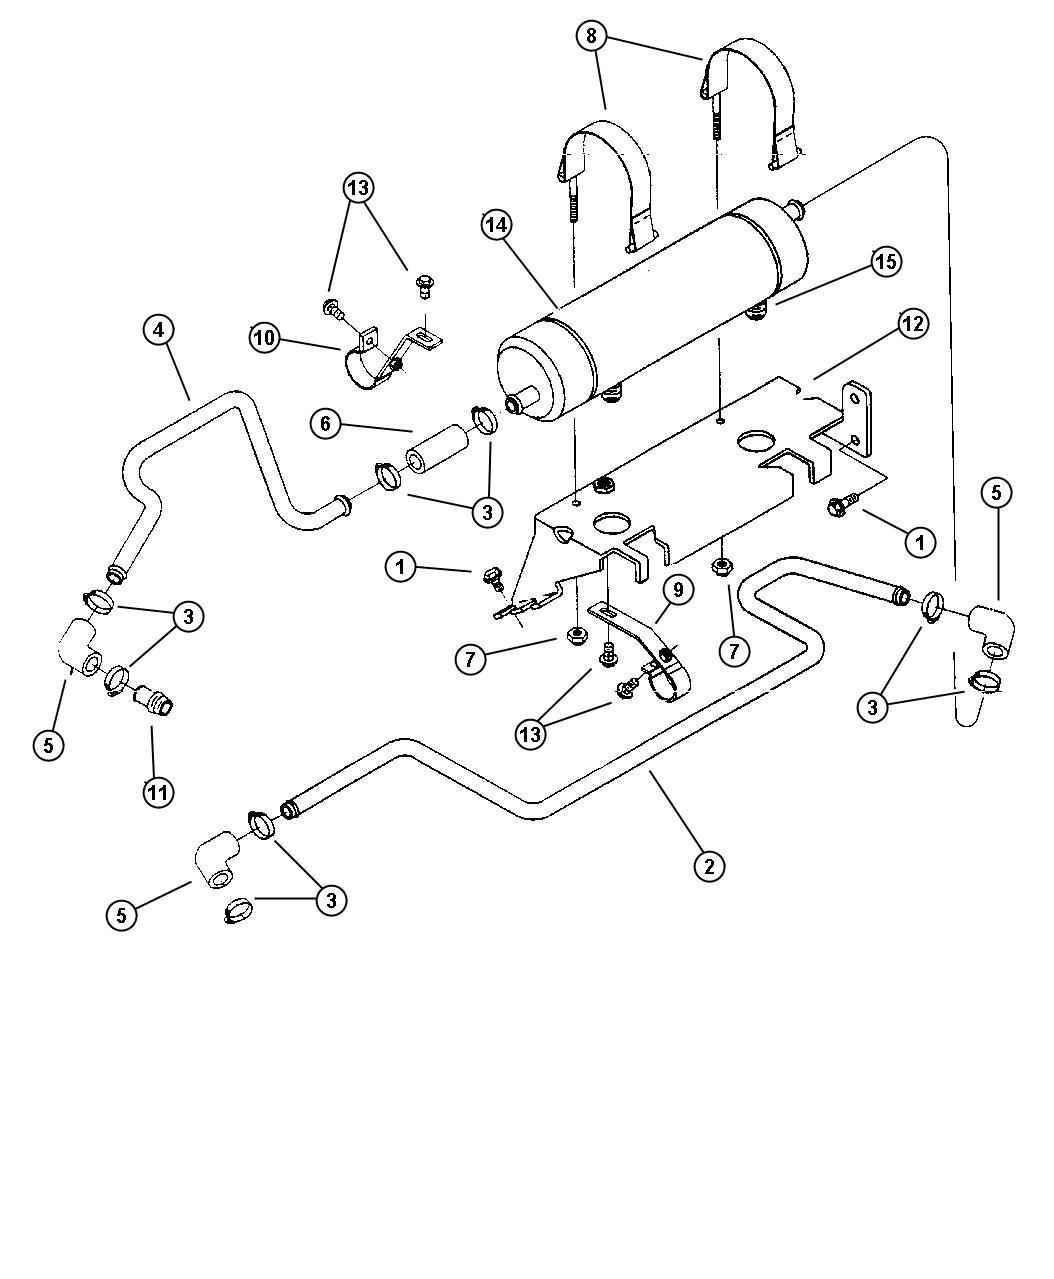 1998 Dodge Ram 3500 Torque Converter Cooler